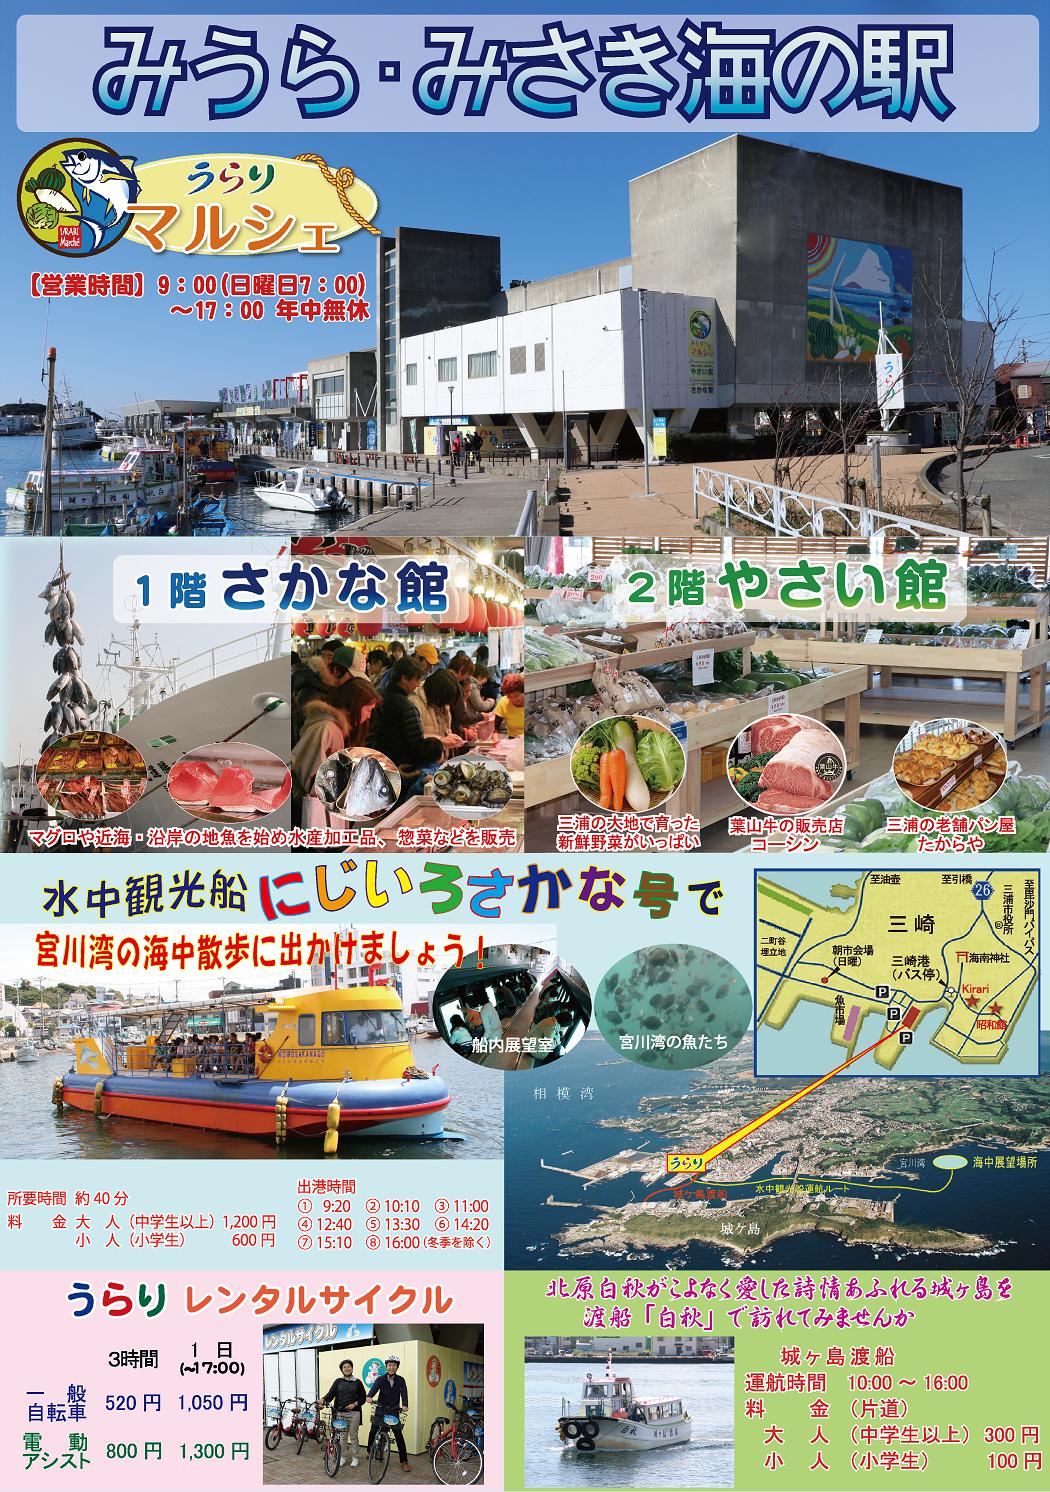 A1_ボートショーポスター.png